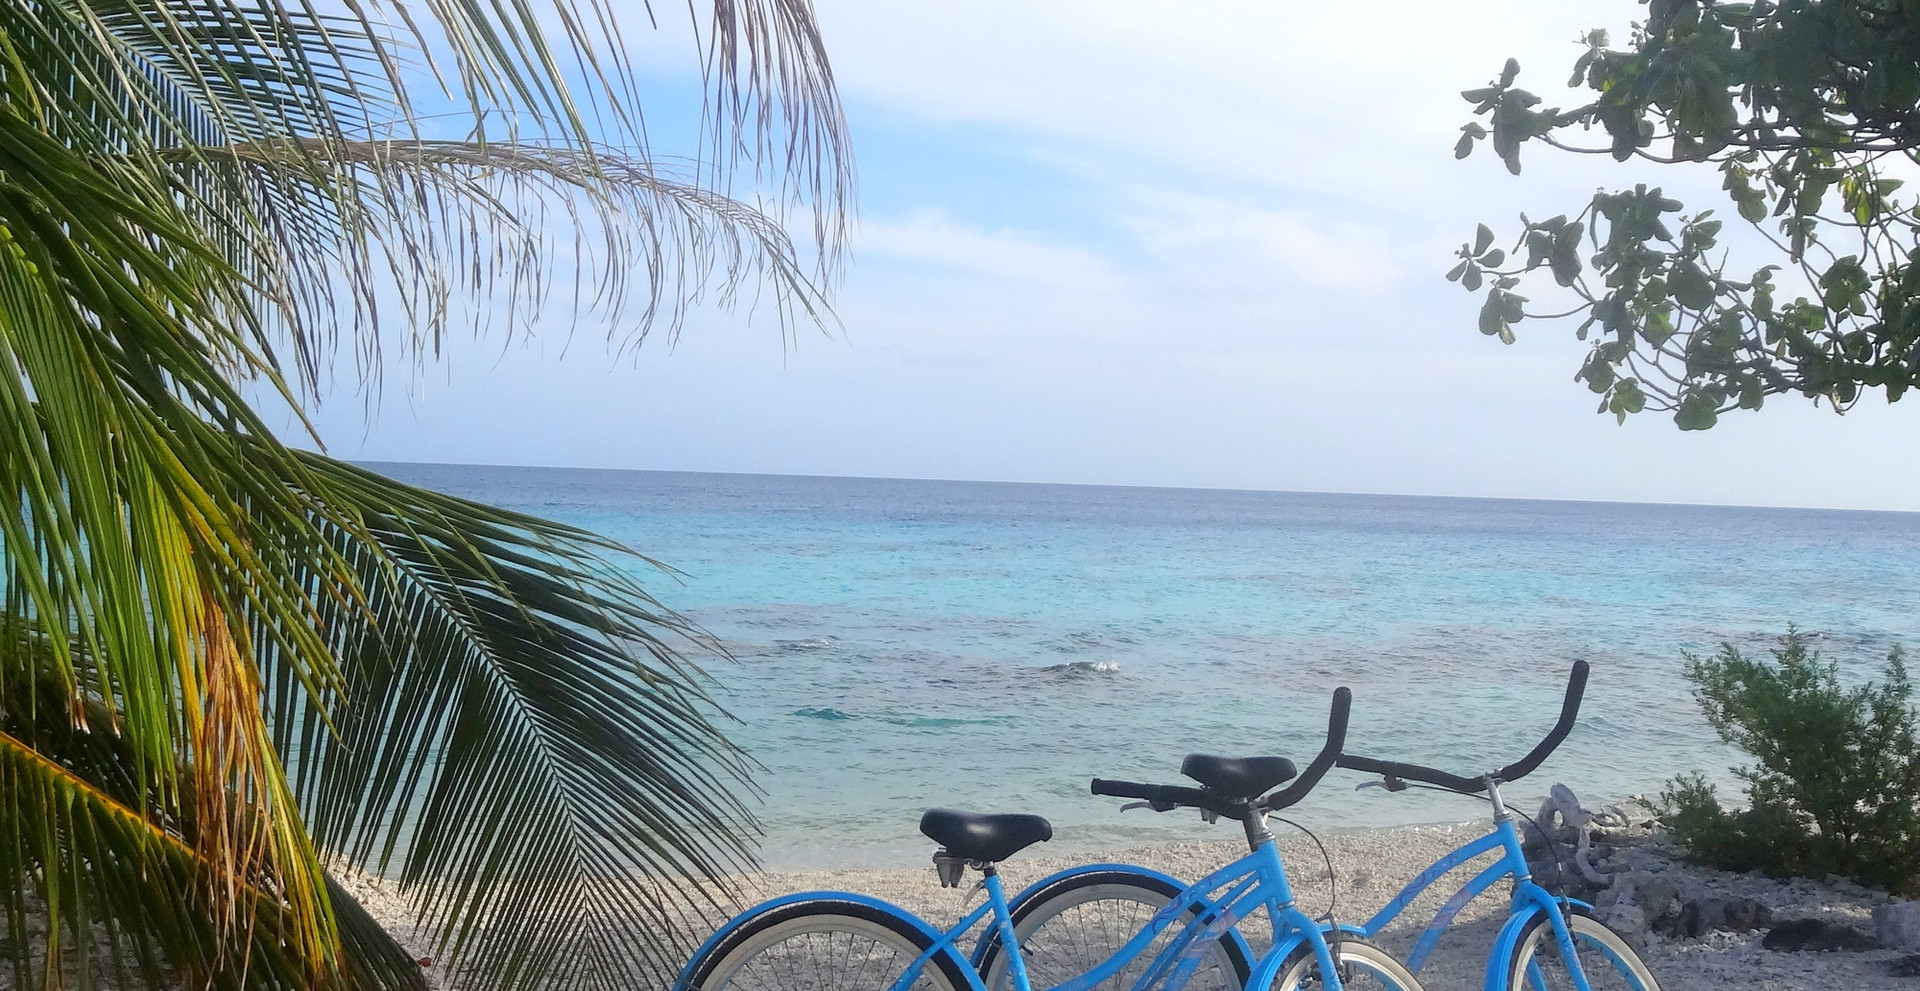 Prêt de vélos gratuits